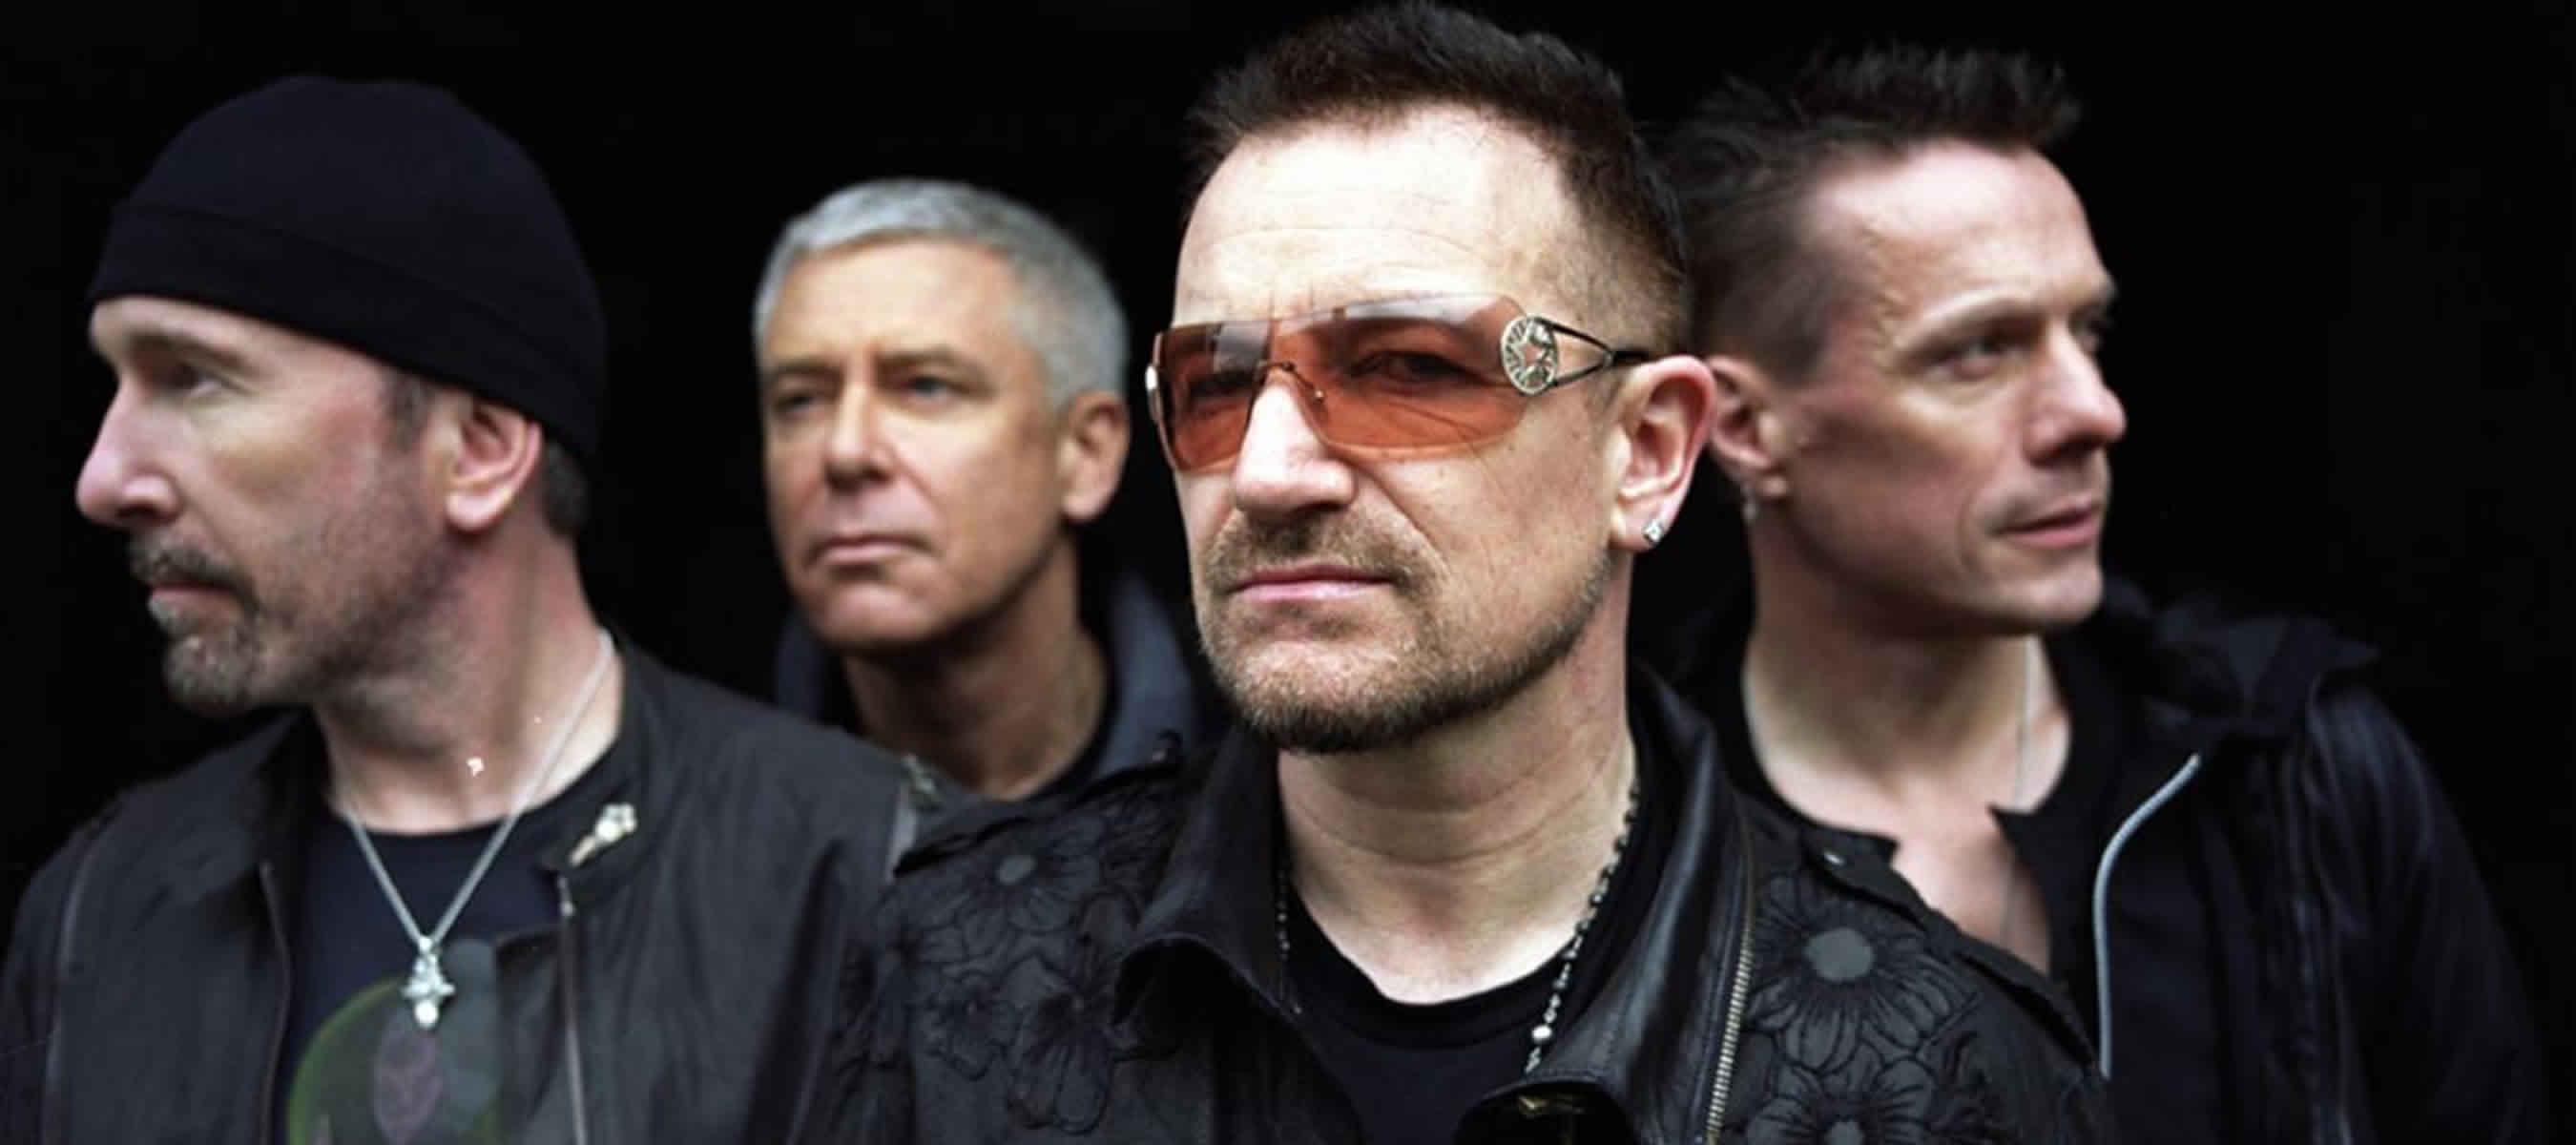 Tributo a U2 - Smoking Molly